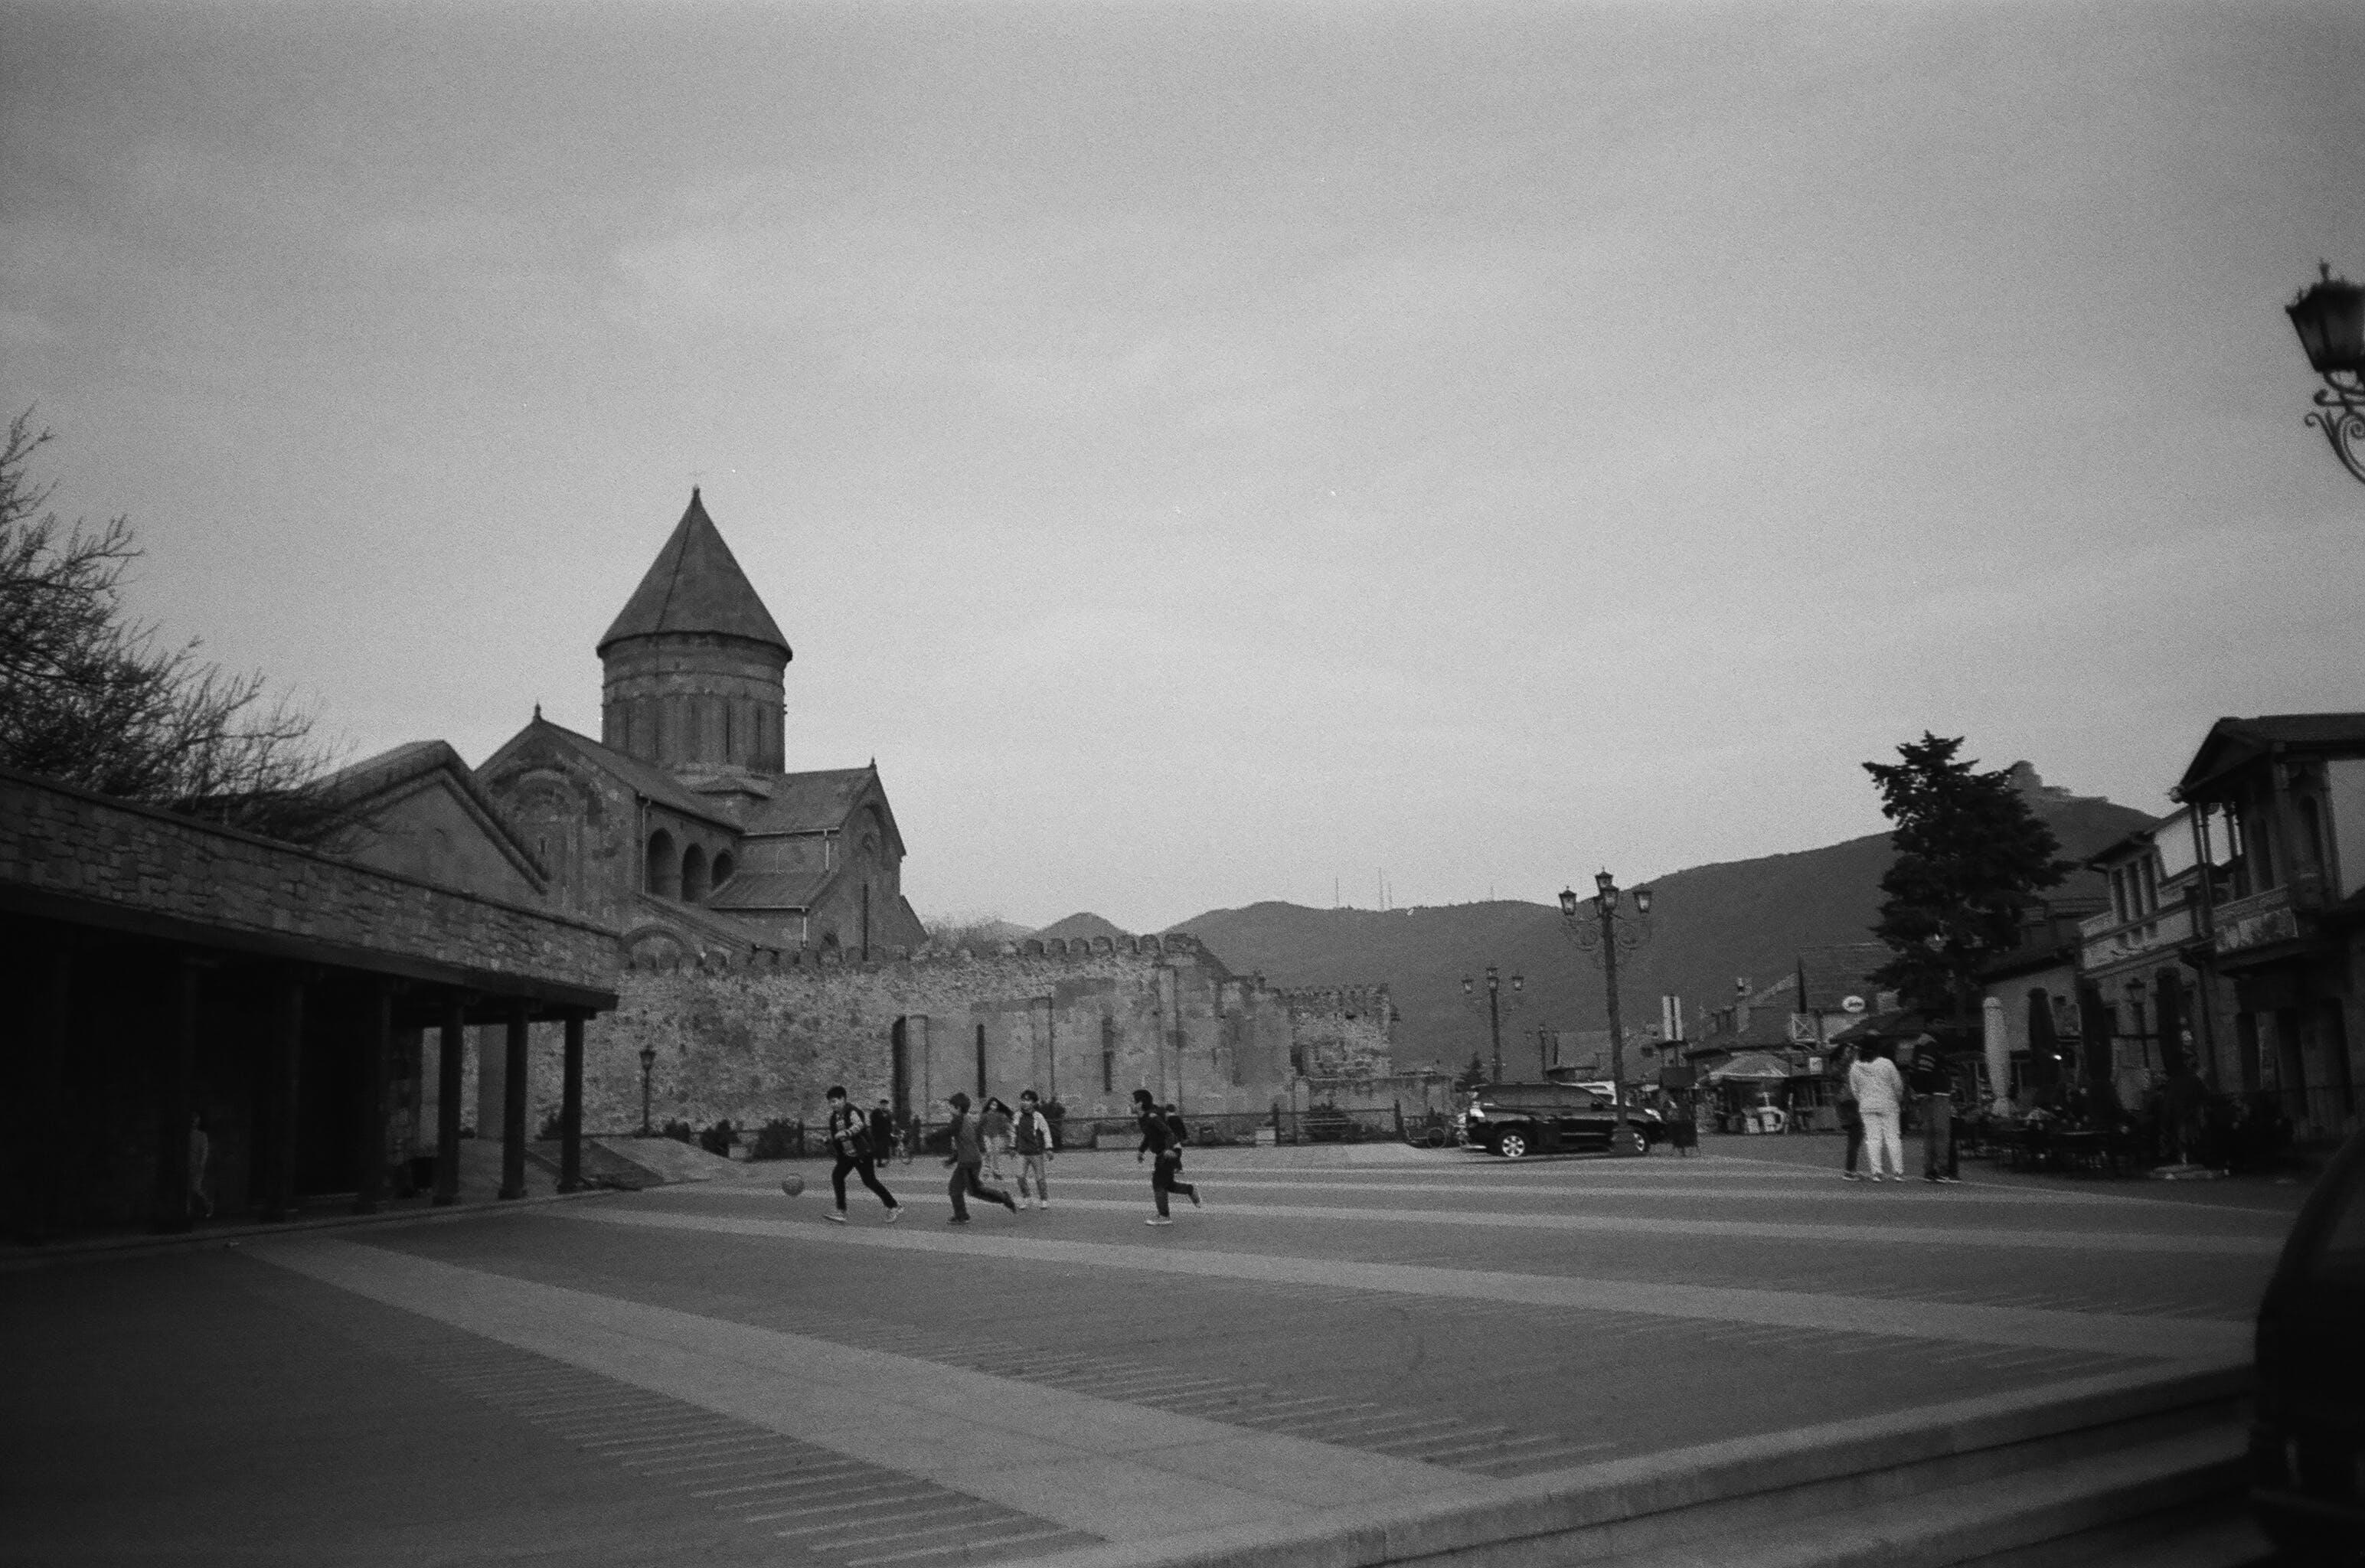 Grayscale Photo of People Between Buildings